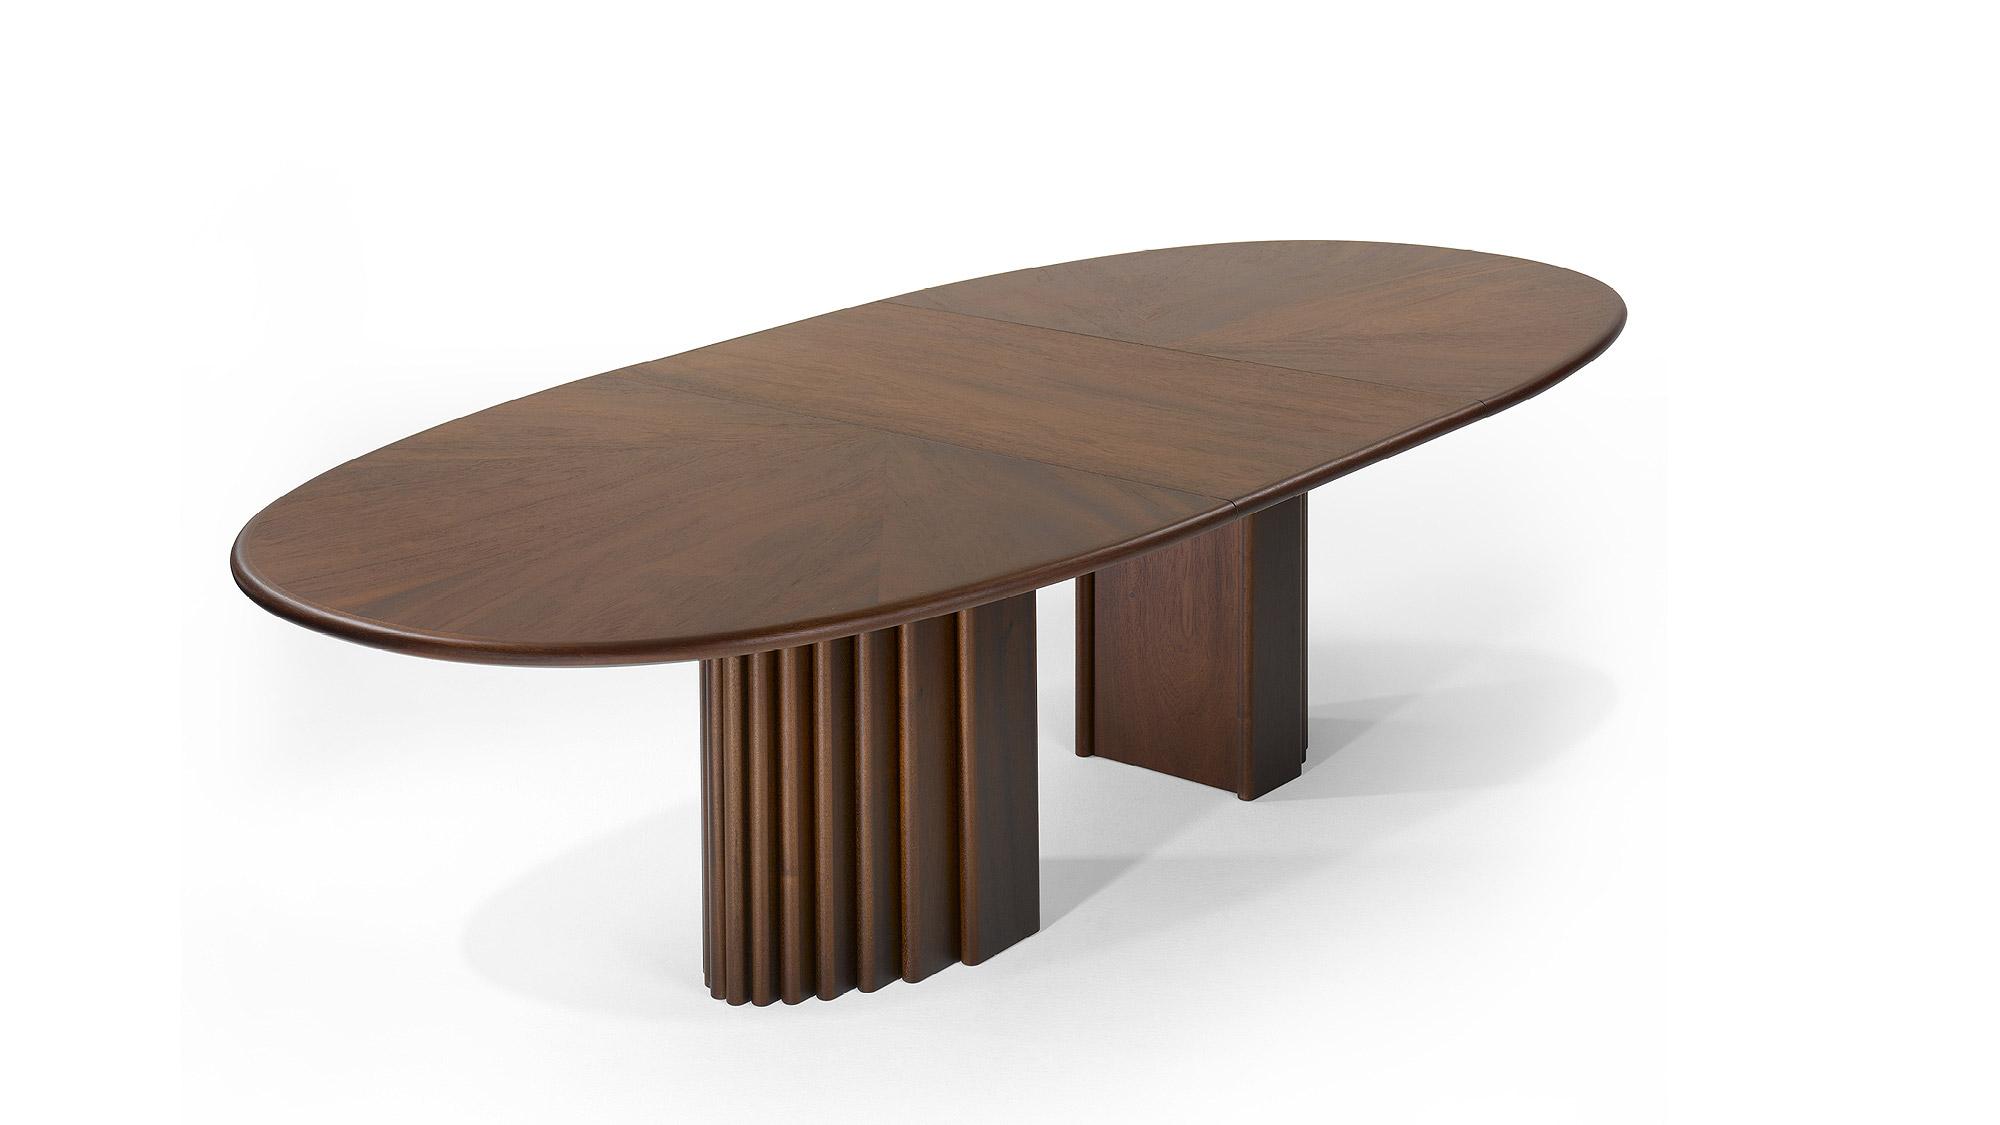 Table basse ovale trevise ezooq com - Fly table pliante ...